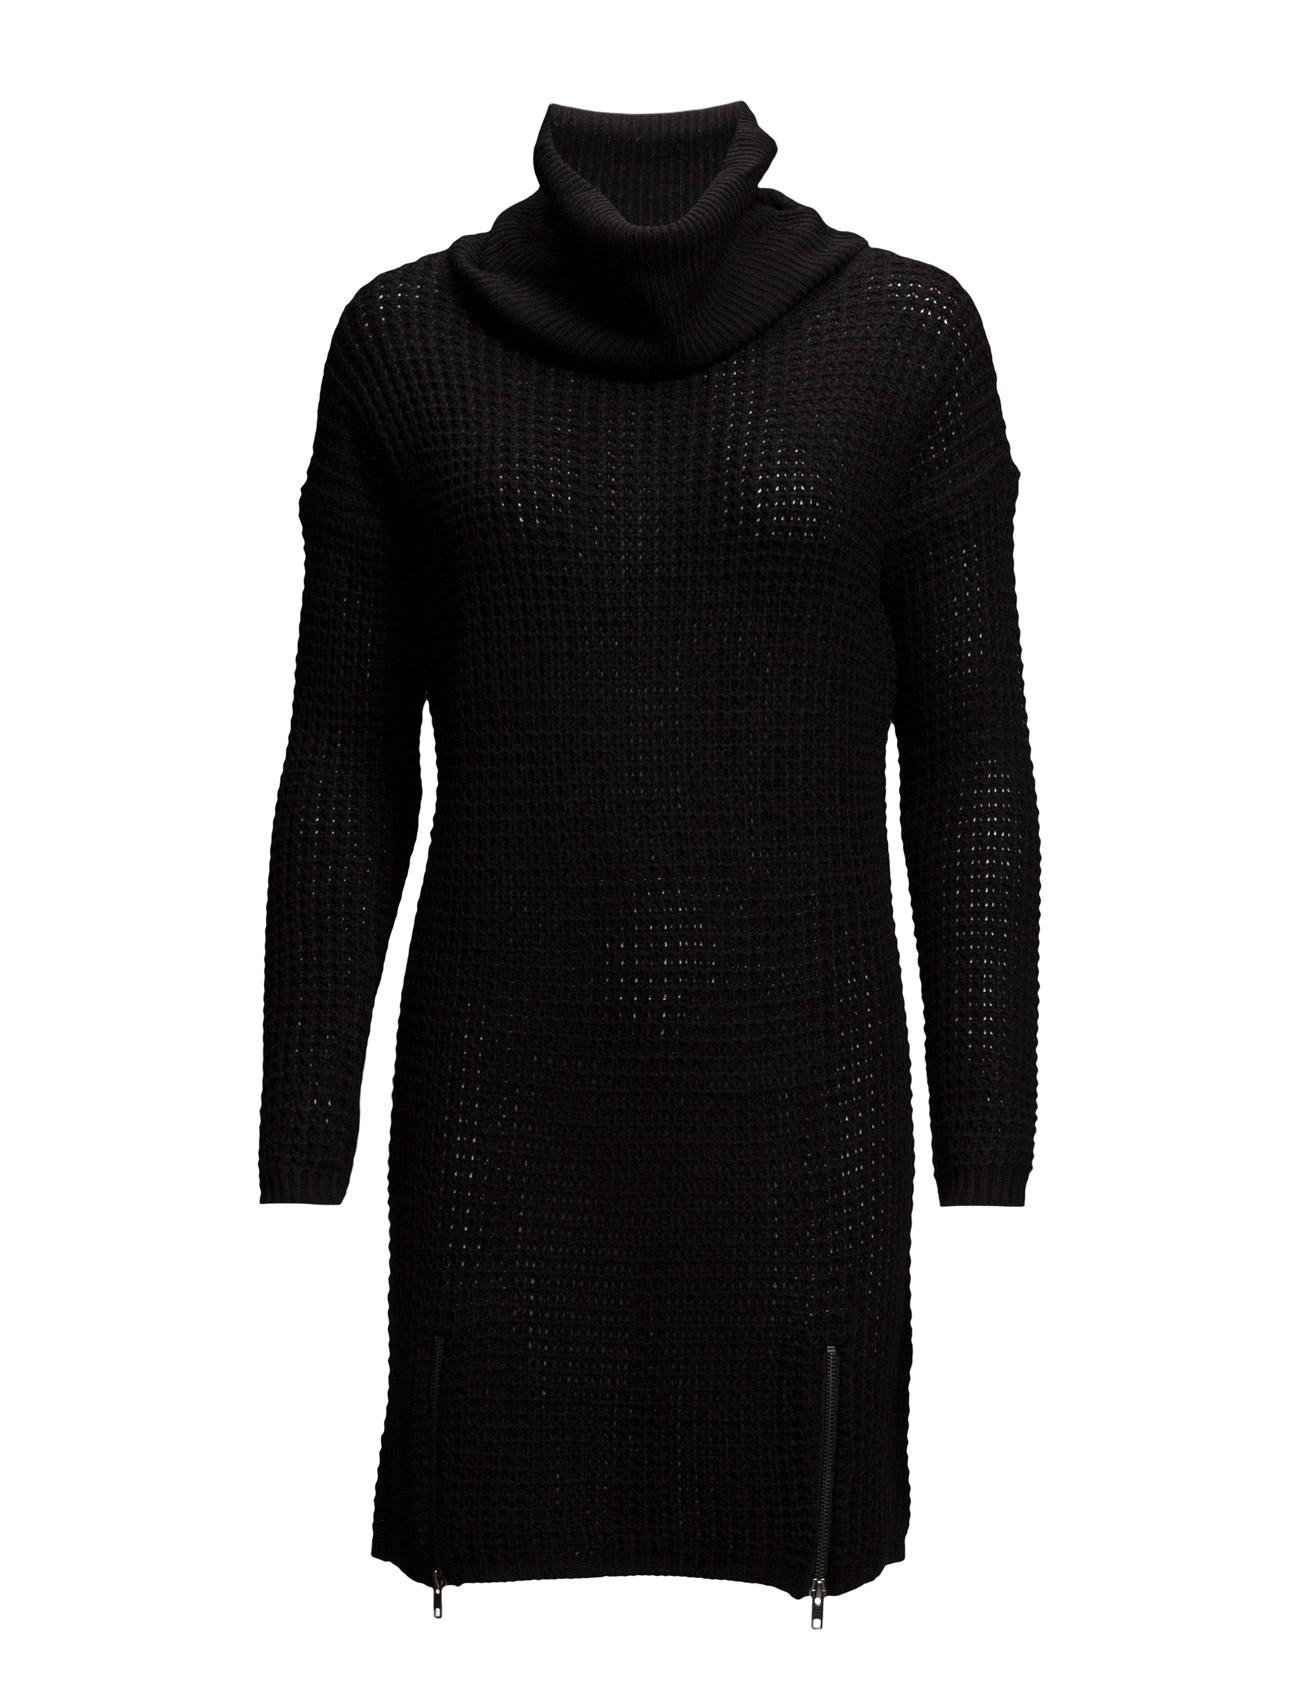 Vmrylie Baize Ls Long Rollneck Dnm A Vero Moda Korte kjoler